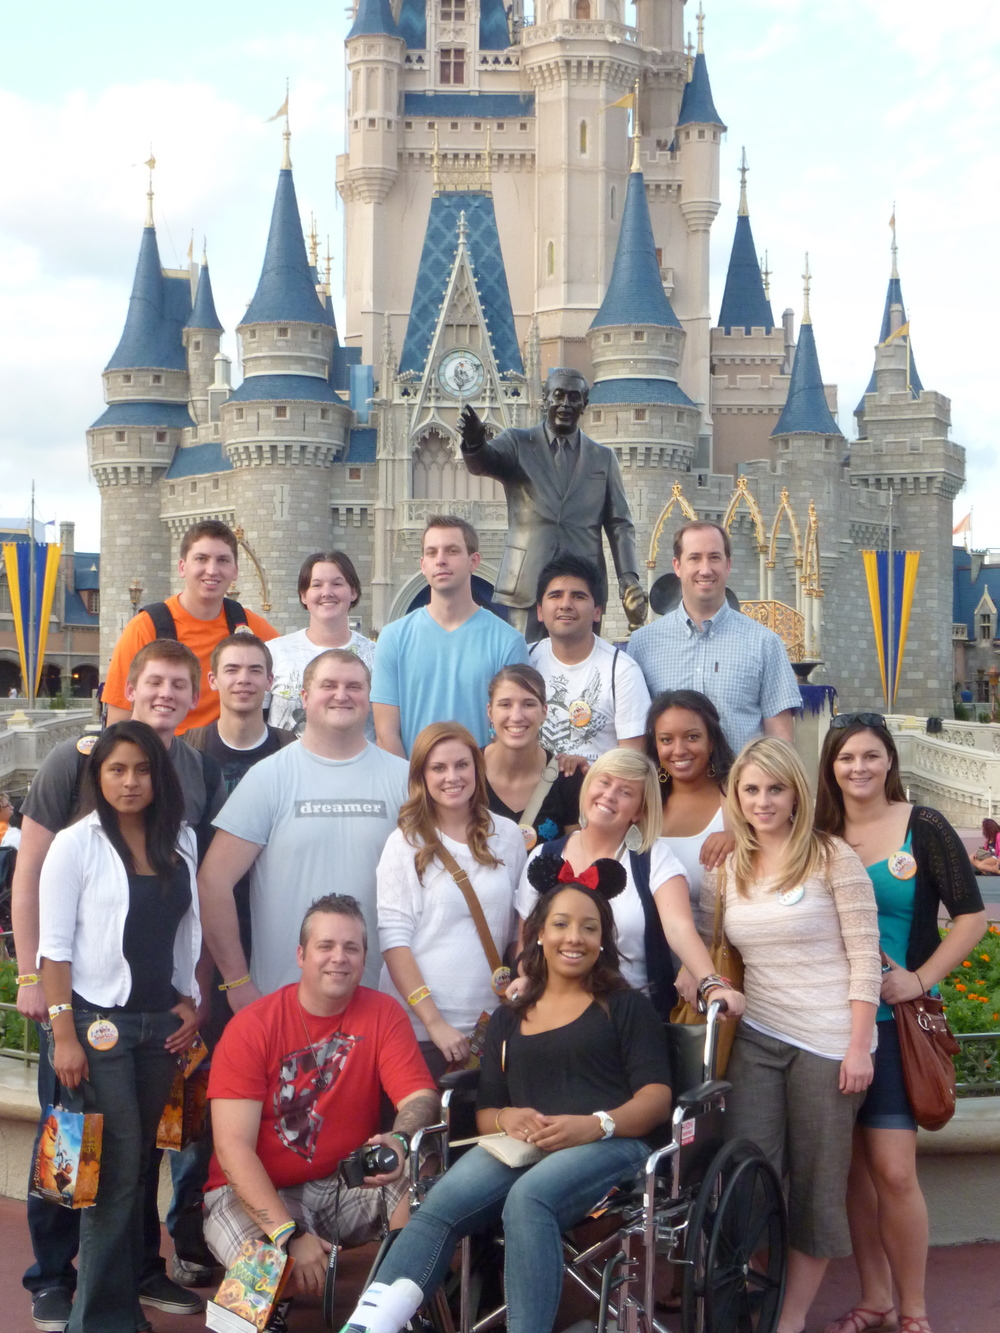 PR students in Orlando - Disney castle.jpg